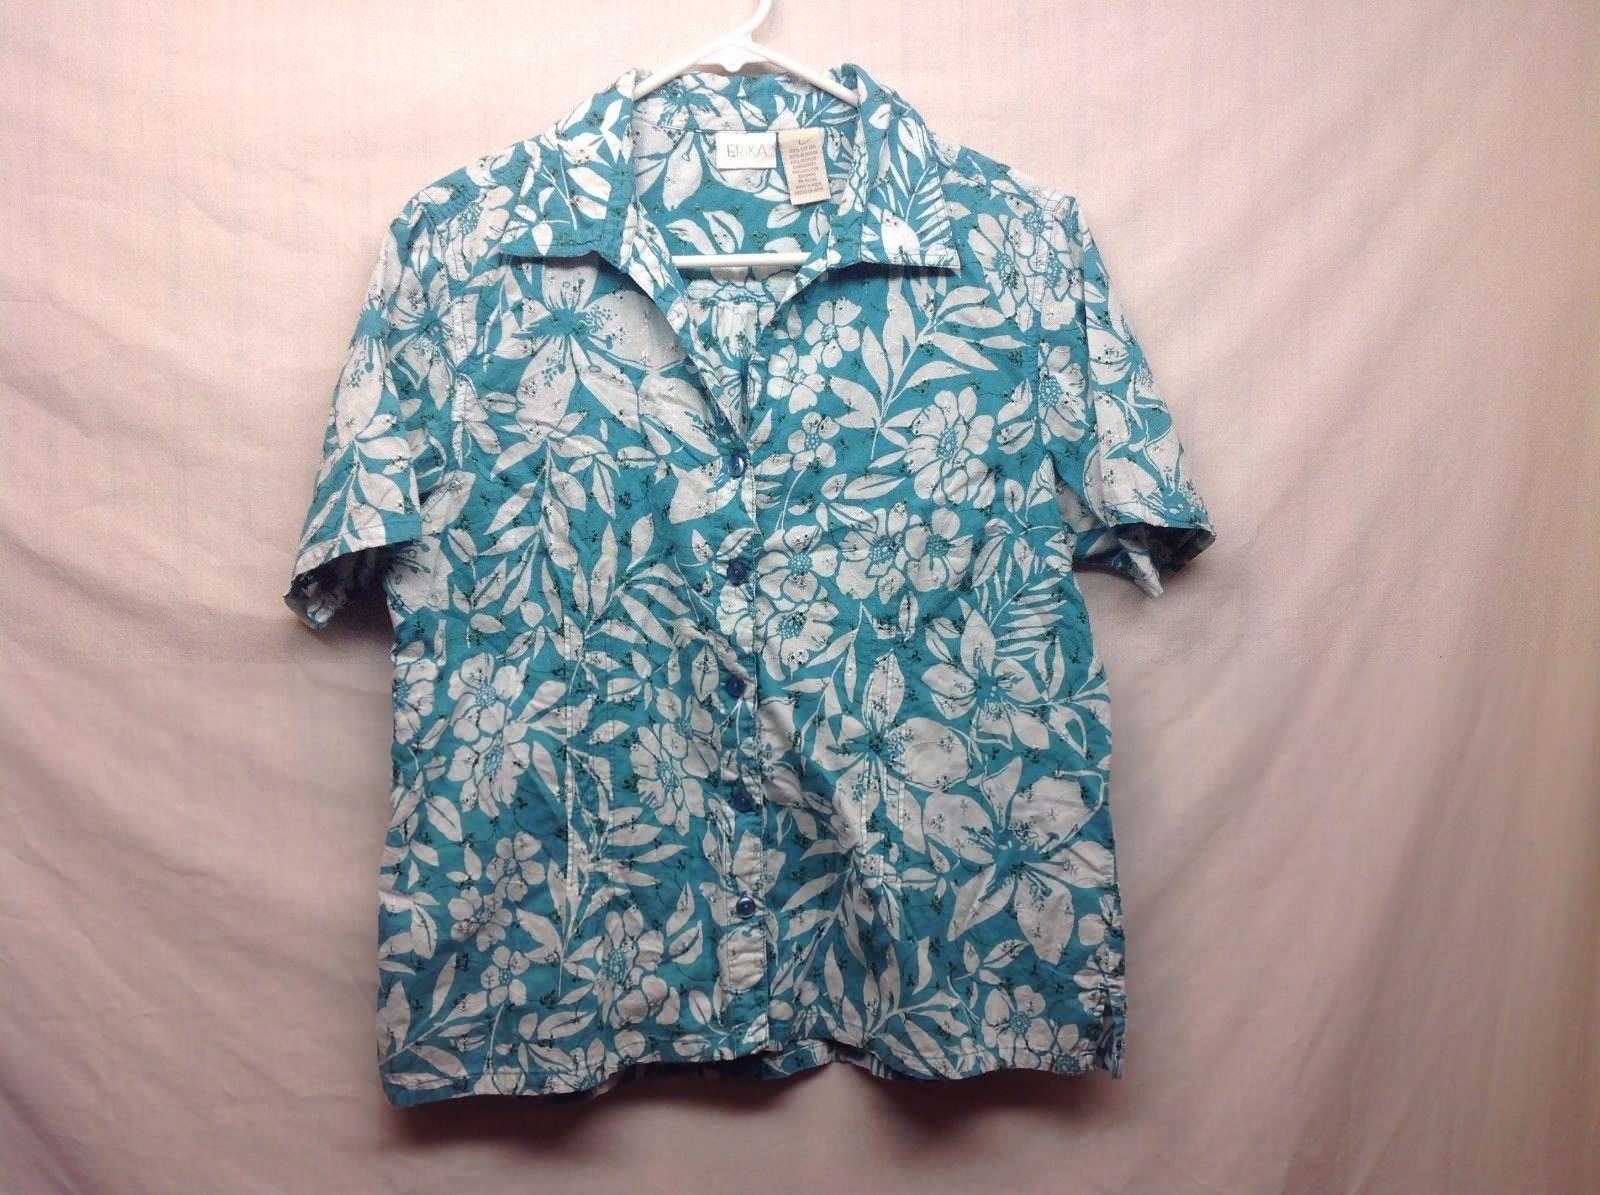 ERIKA V-Neck Button Up Light Blue w White Floral Pattern Shirt Sz LG